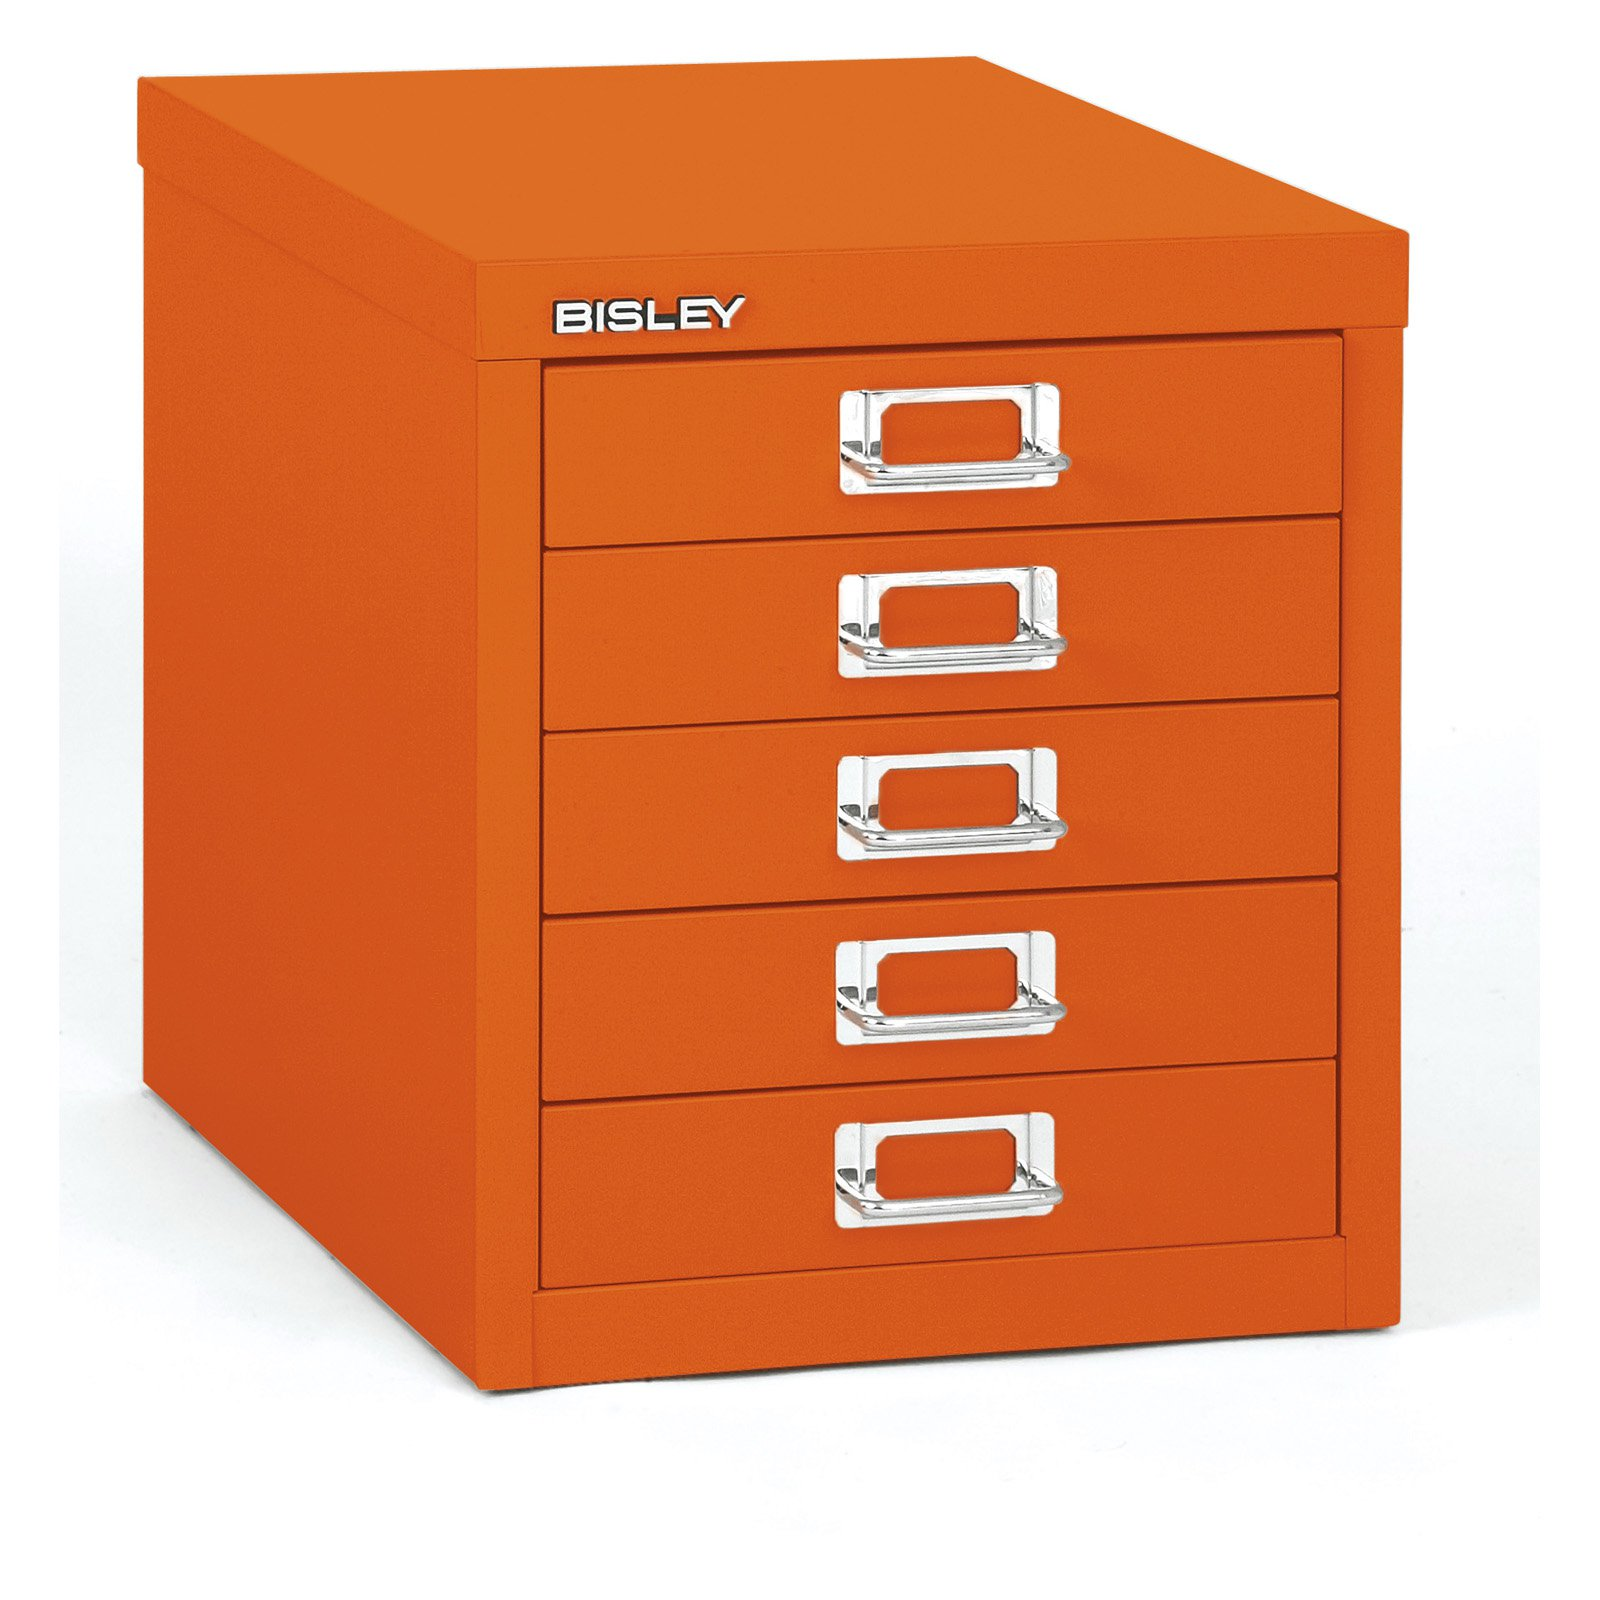 Bisley Steel 5 Drawer Desktop Multidrawer Storage Cabinet   Walmart.com